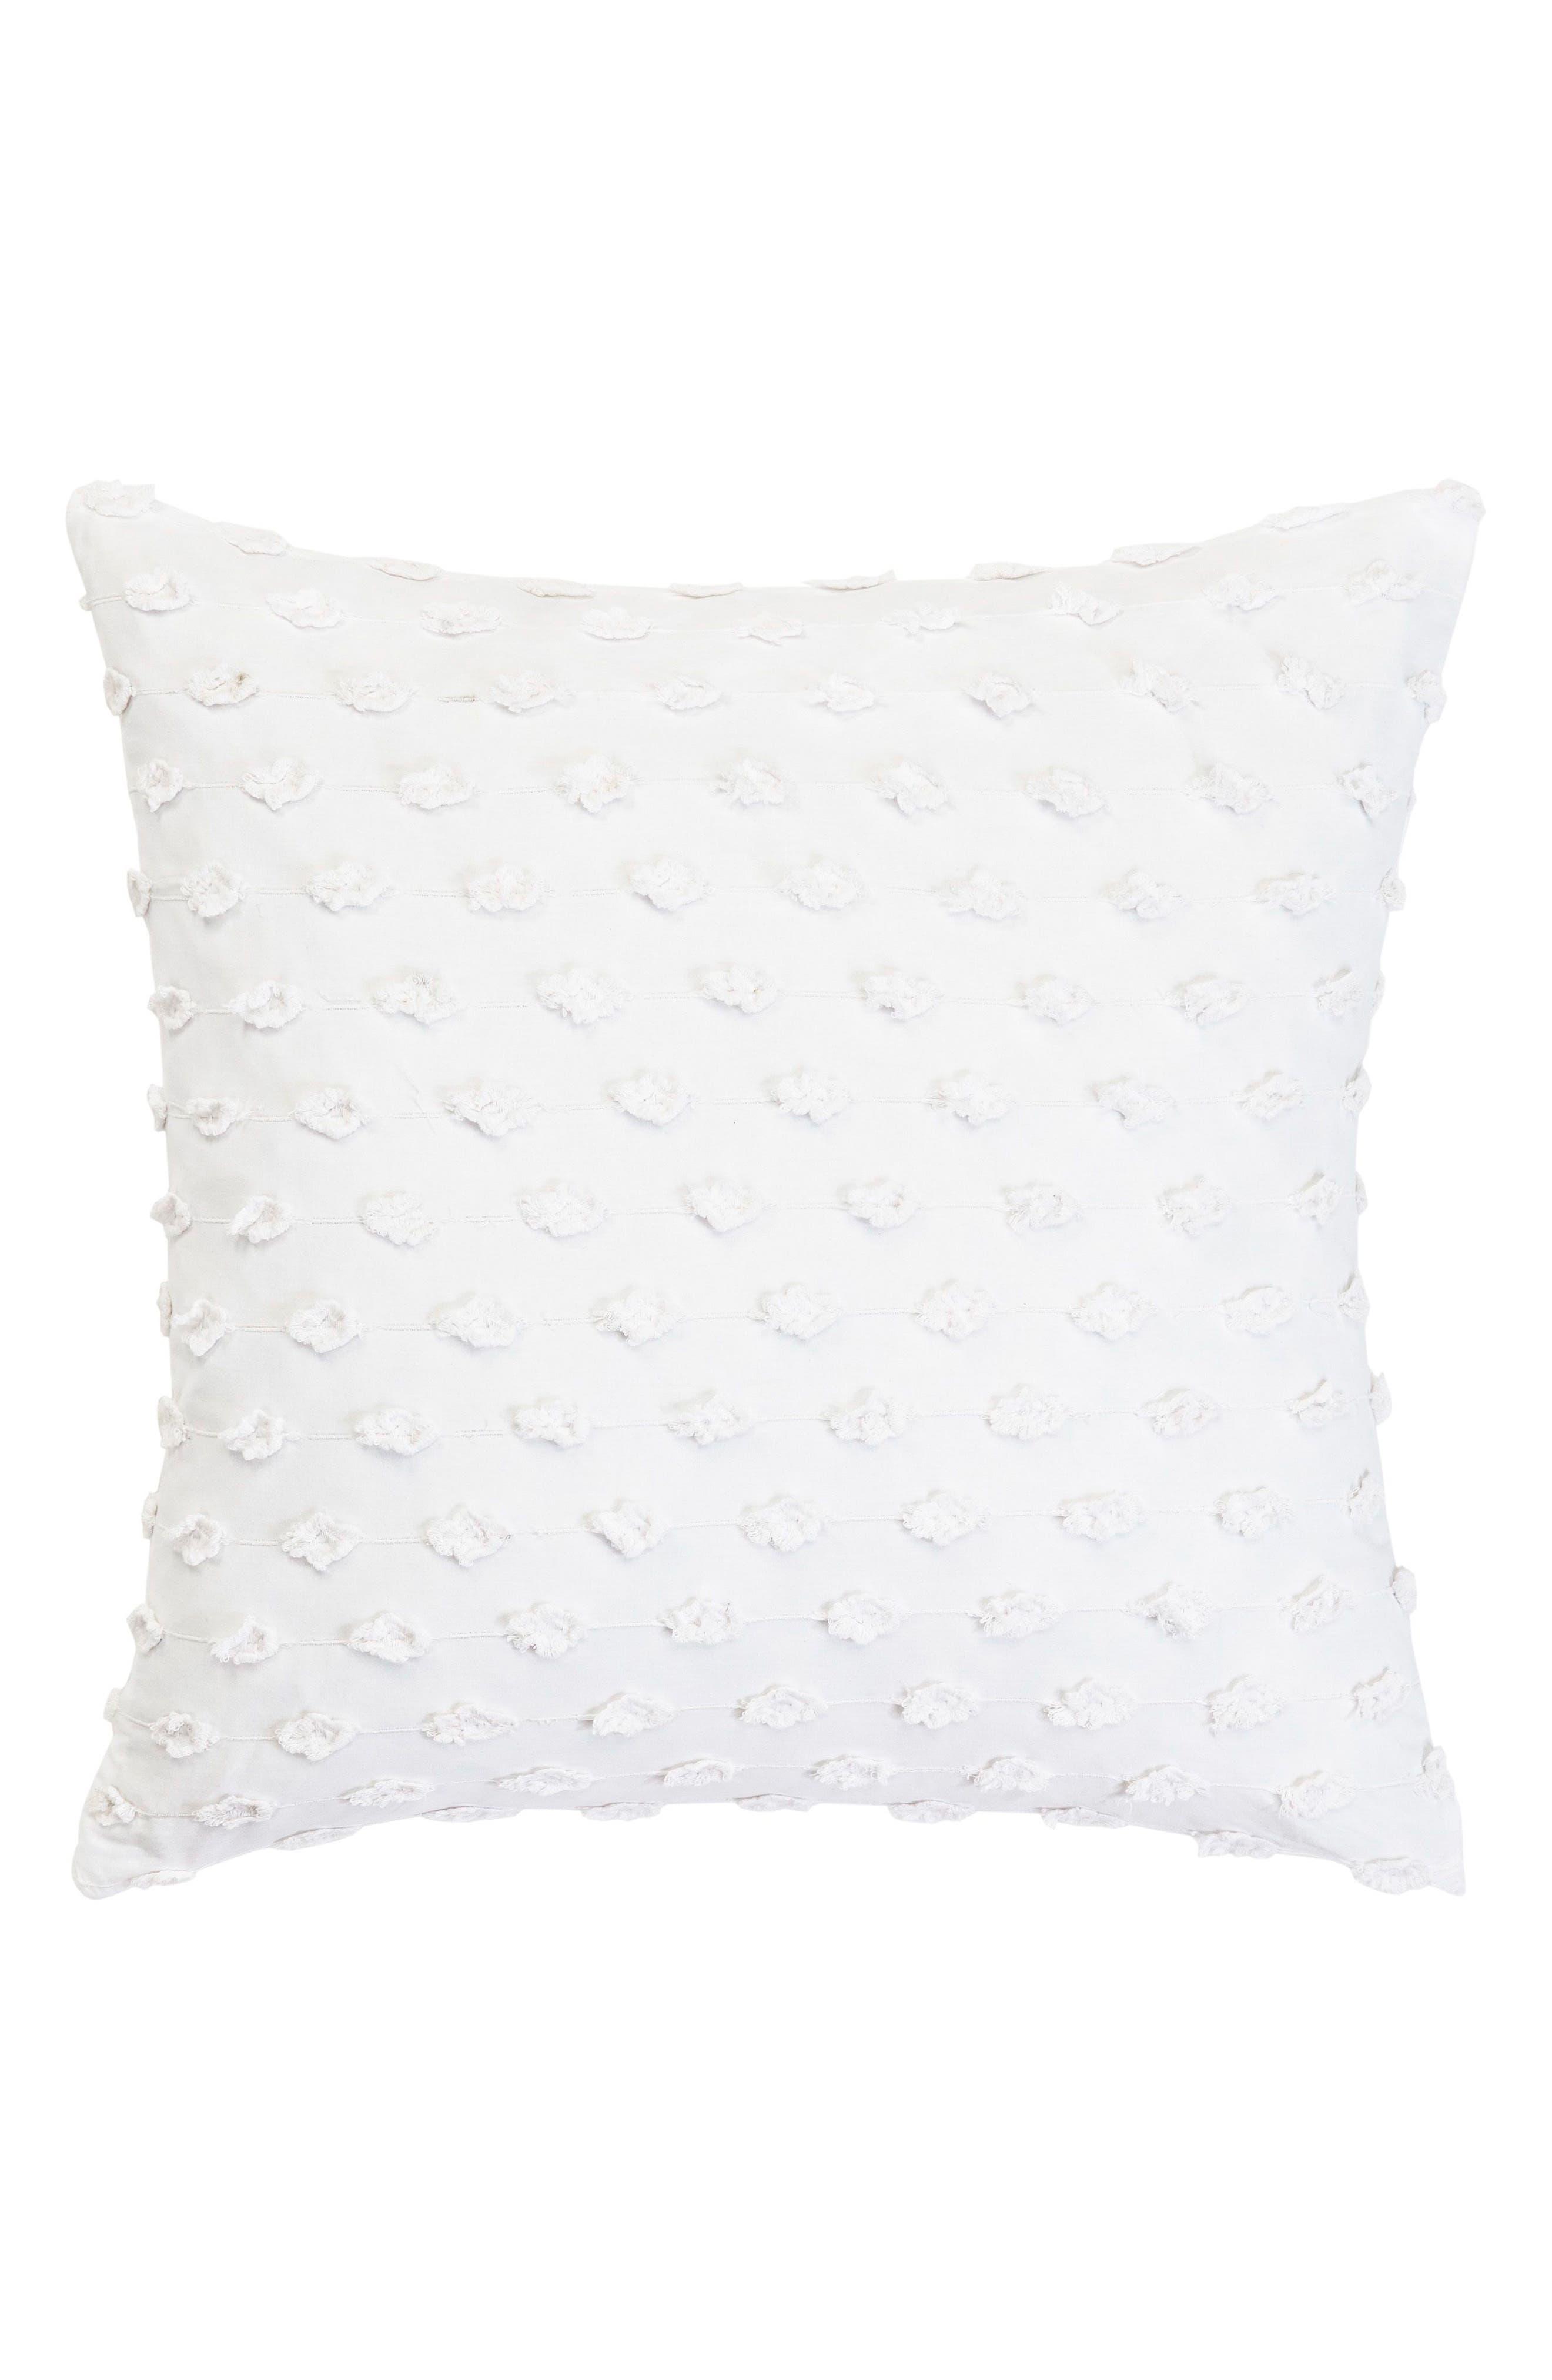 Trina Turk Fringe Accent Pillow